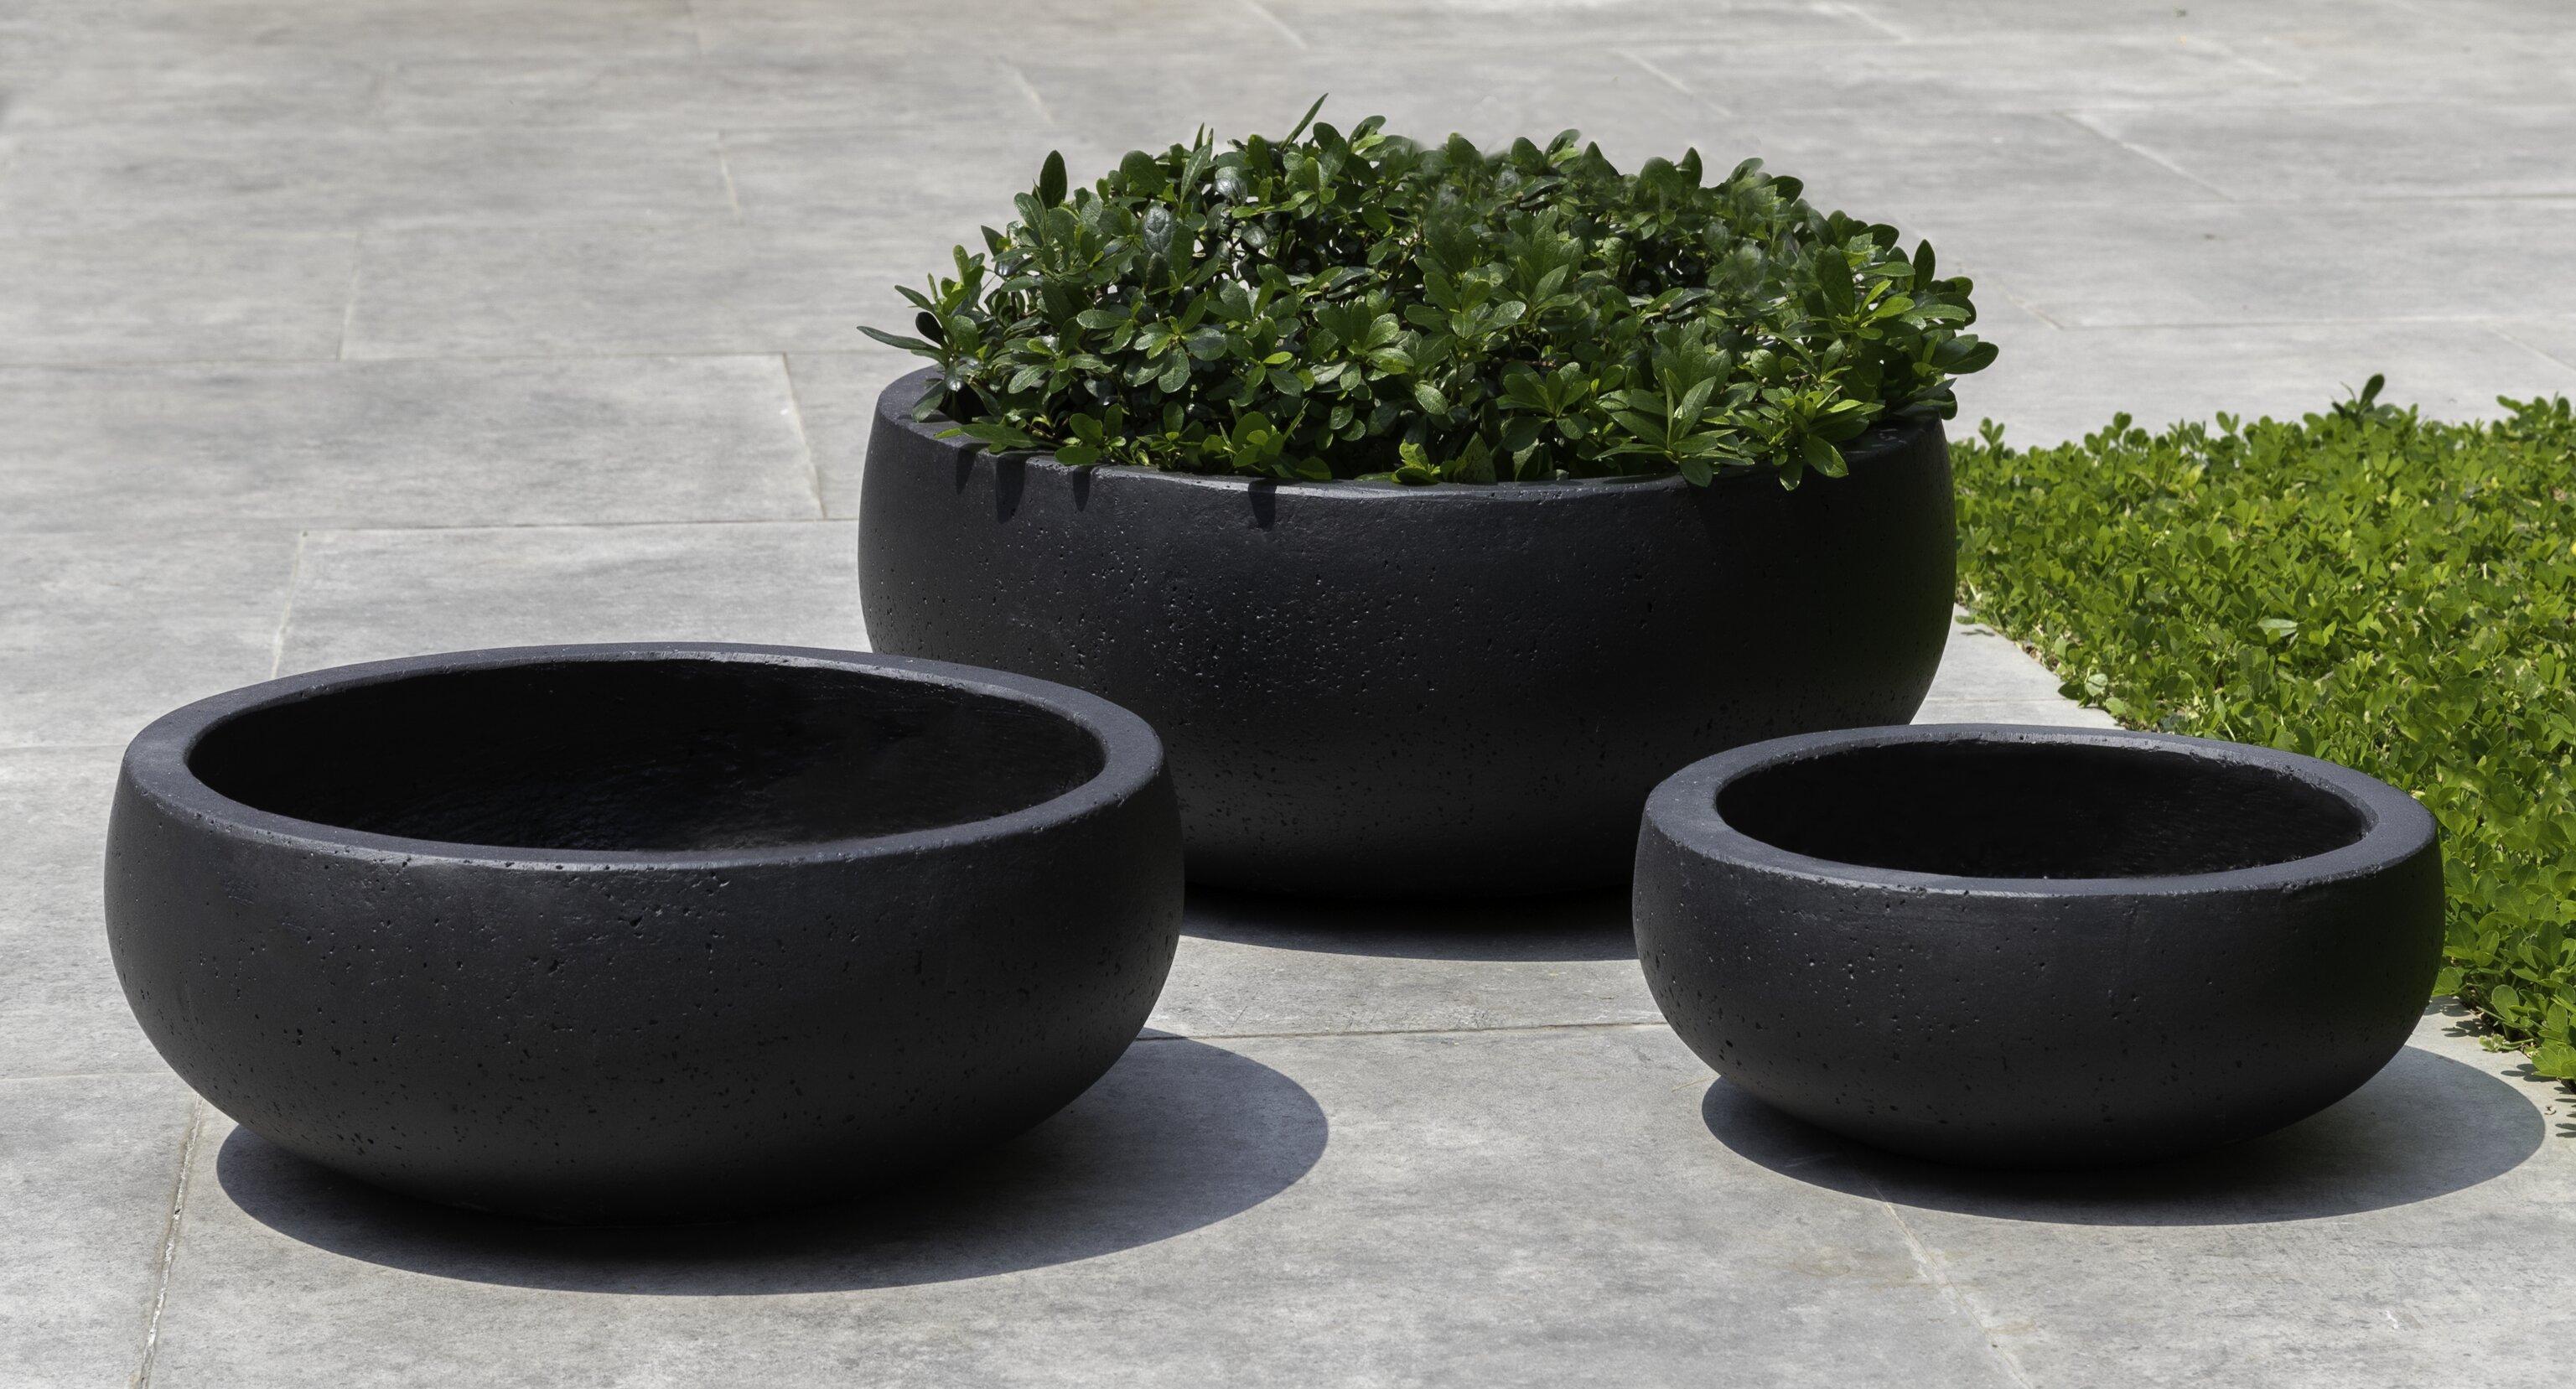 Brayden Studio Rio 3 Piece Composite Pot Planter Set Wayfair